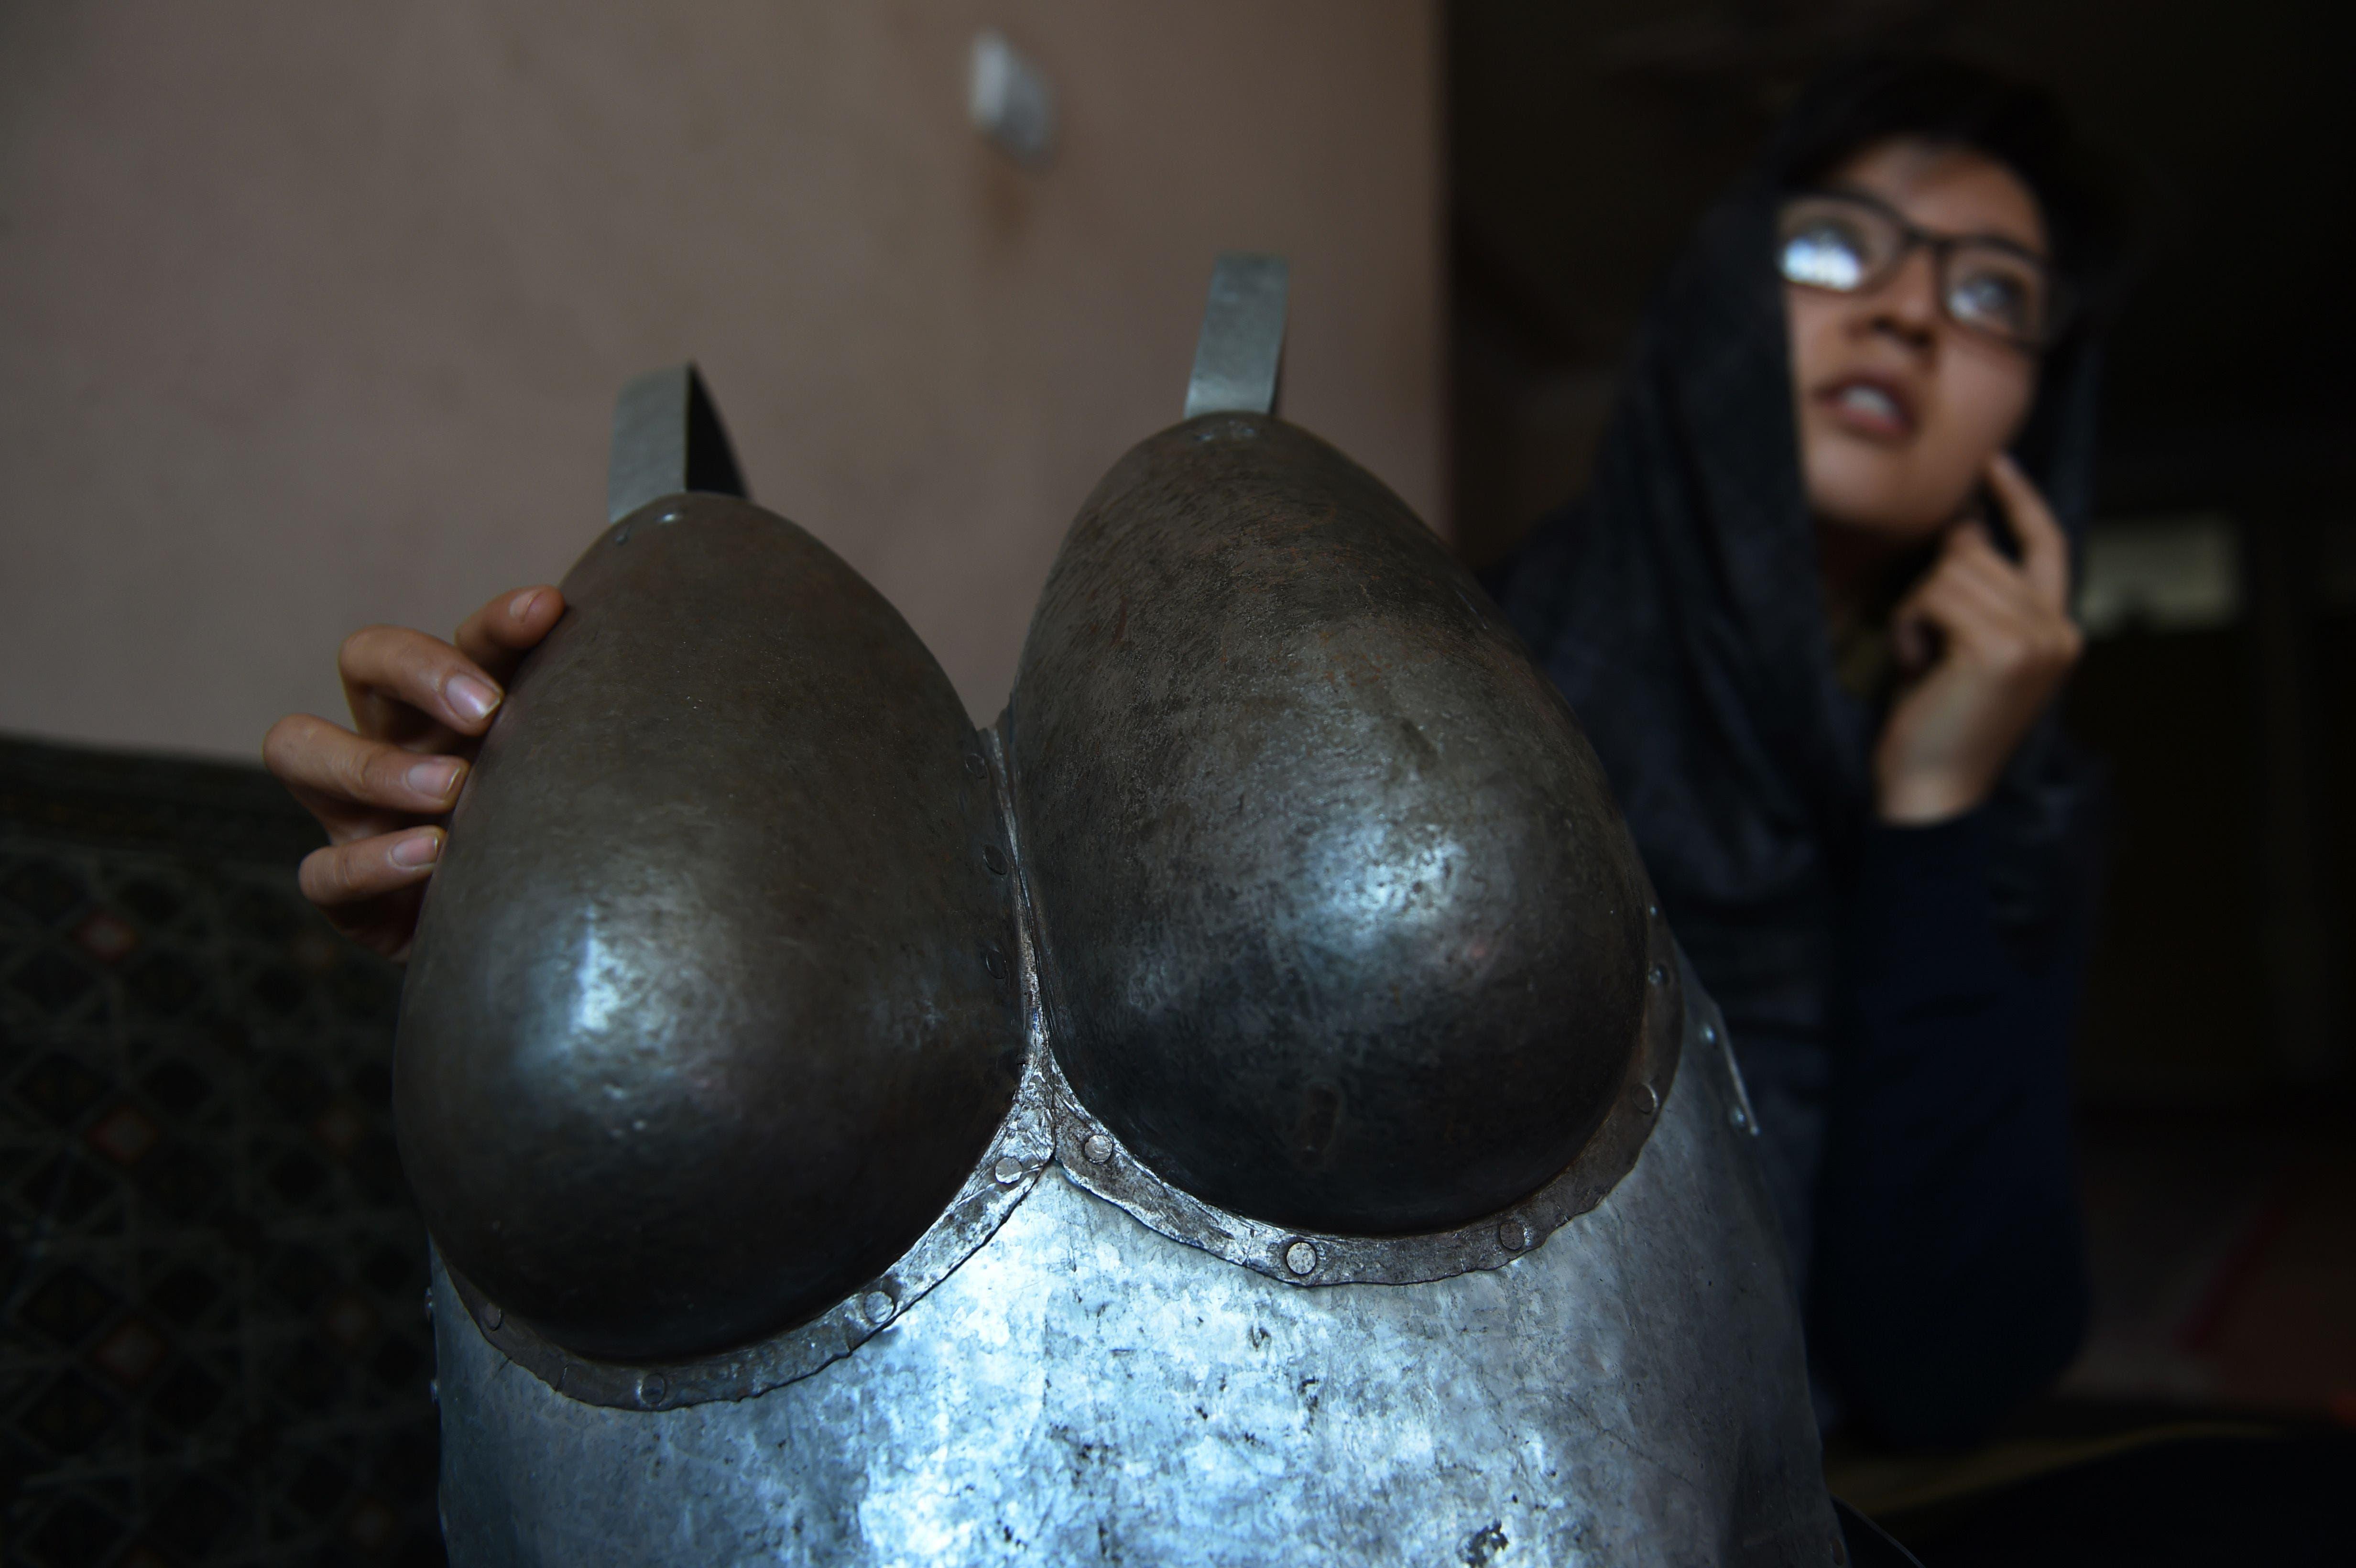 breast armor